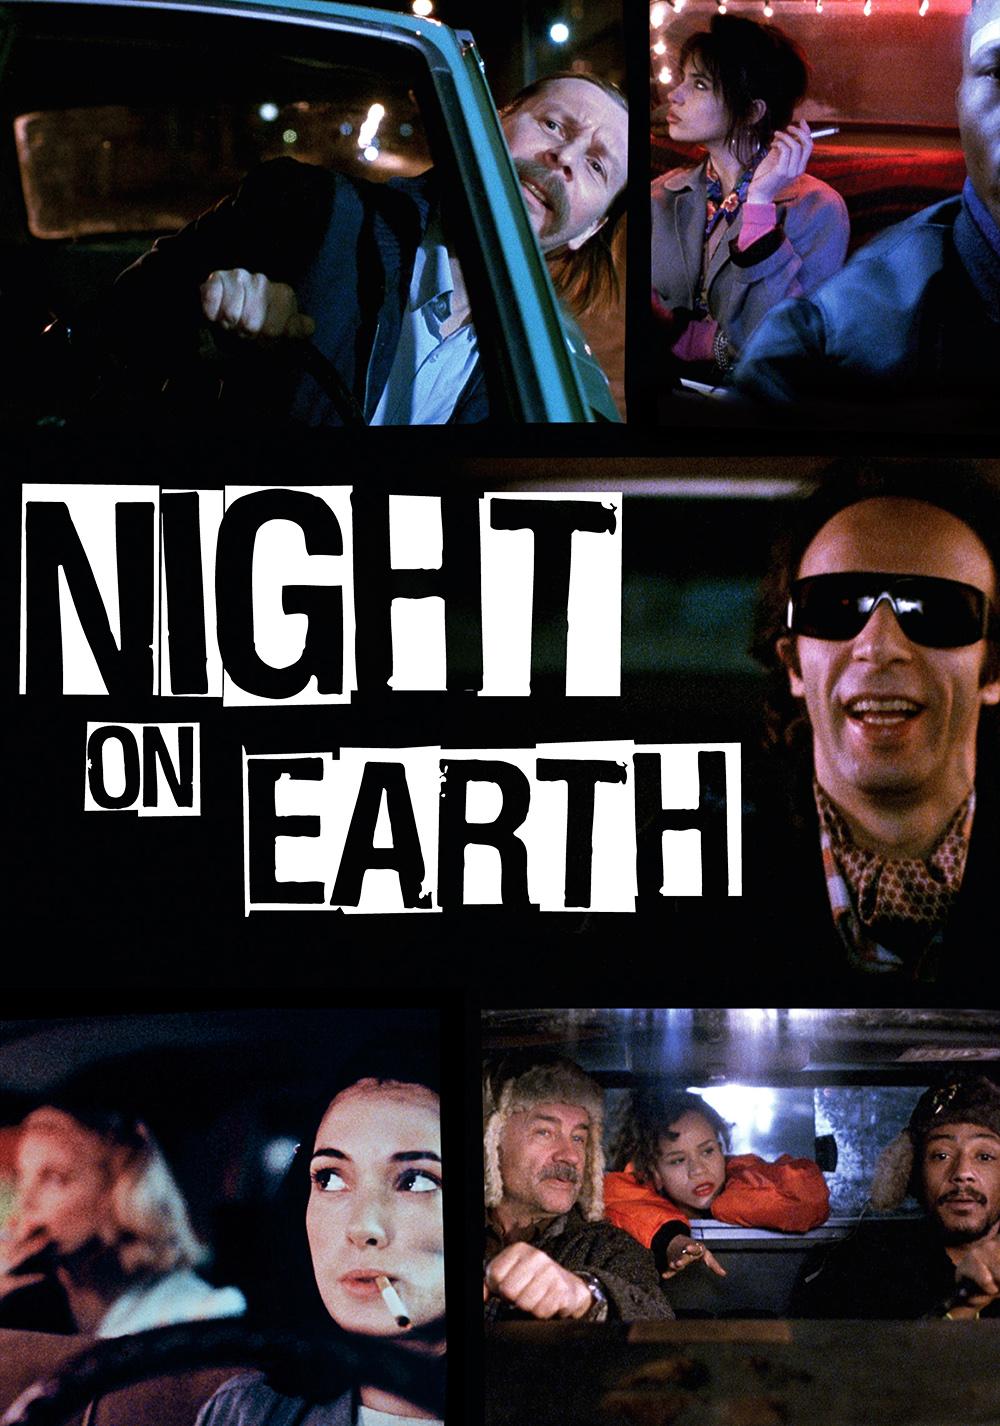 night-on-earth-53f4c5cc8d4bb.jpg